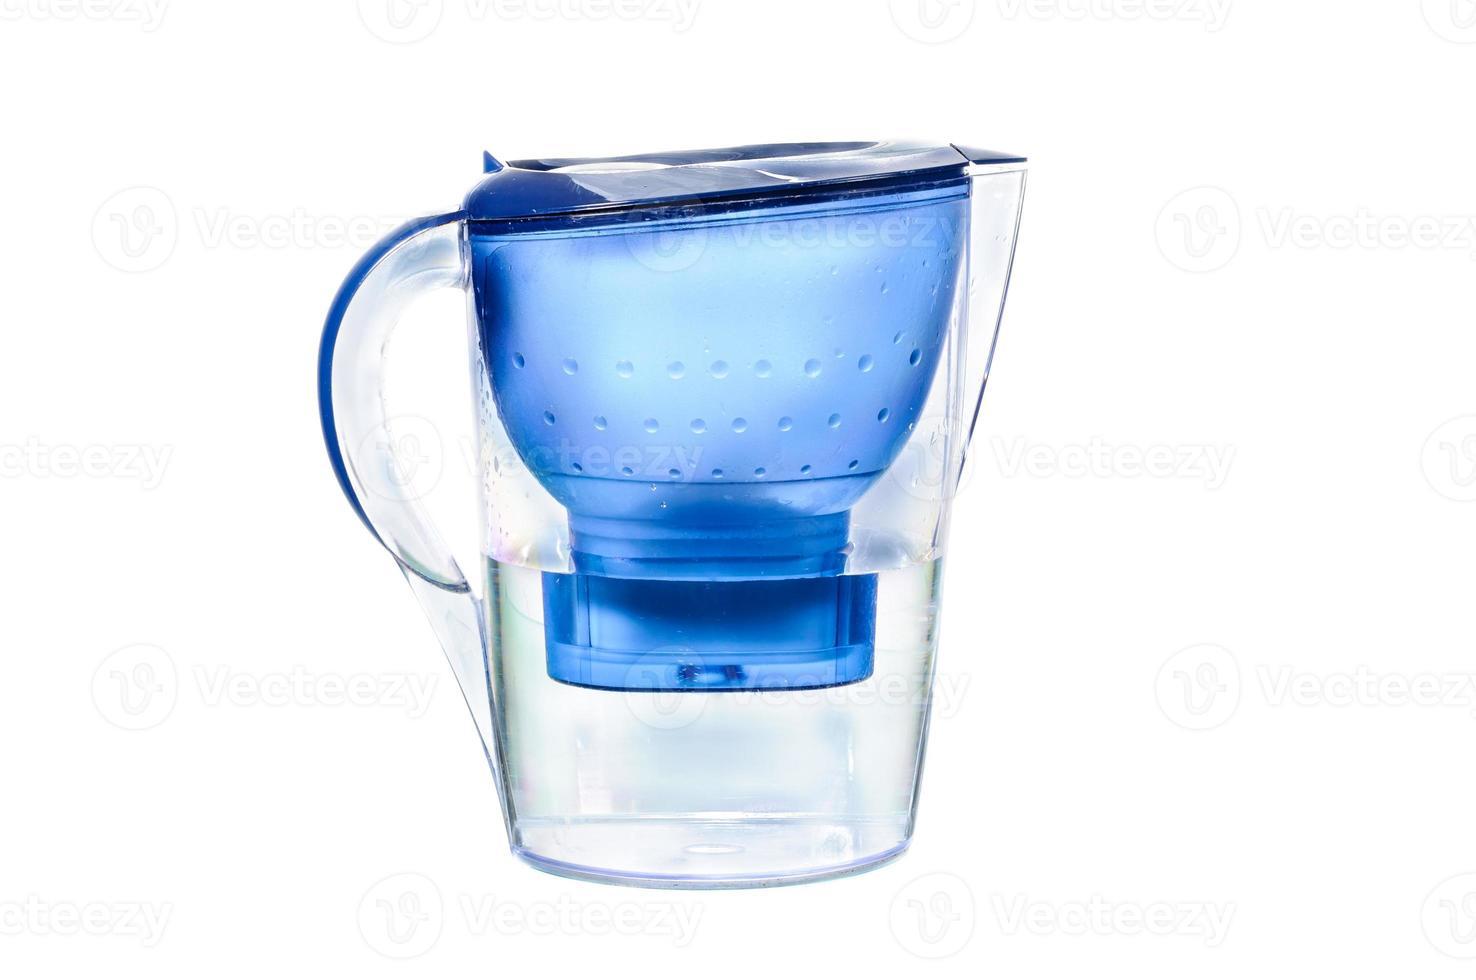 acqua filtrata fresca per bevanda foto